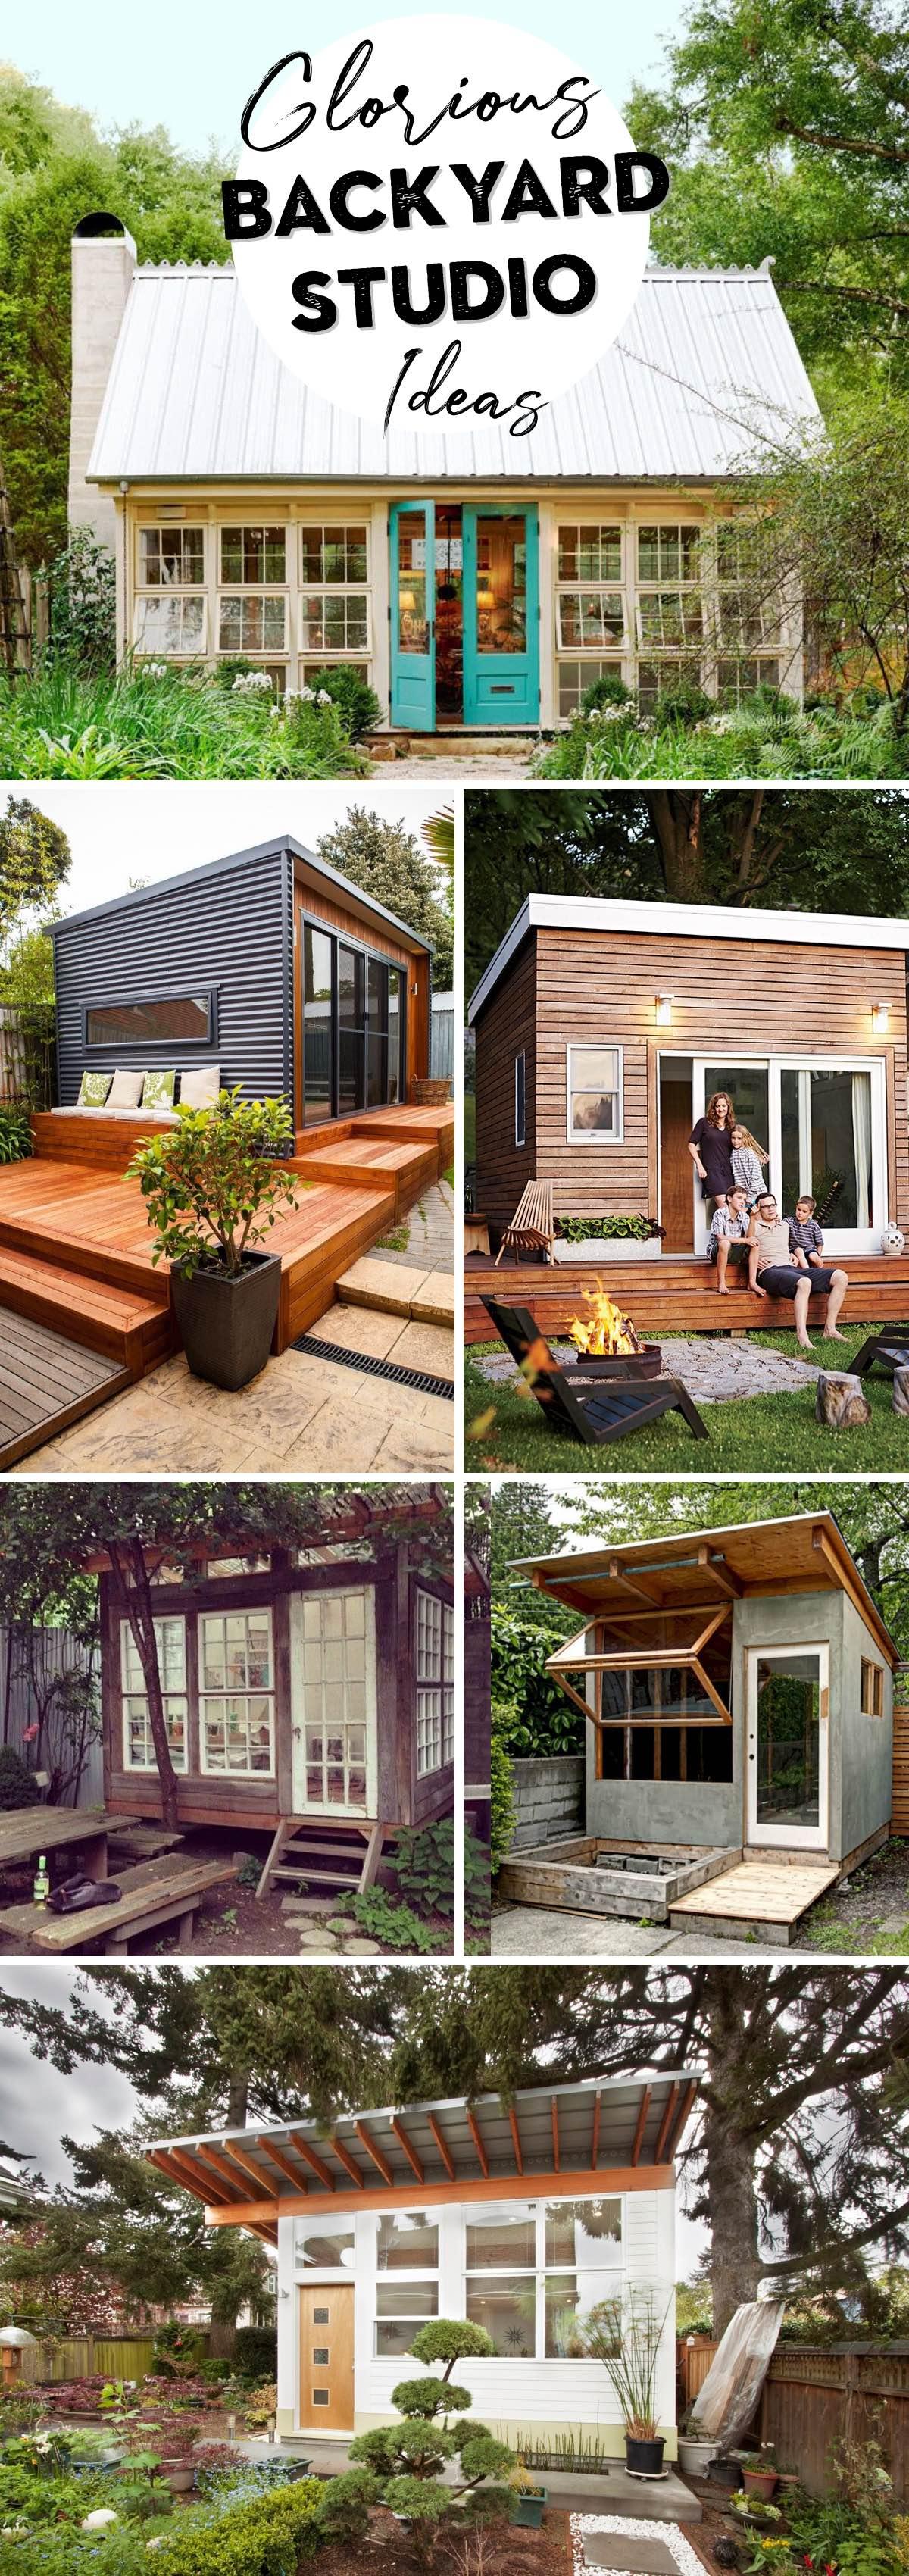 Glorious Backyard Studio Ideas